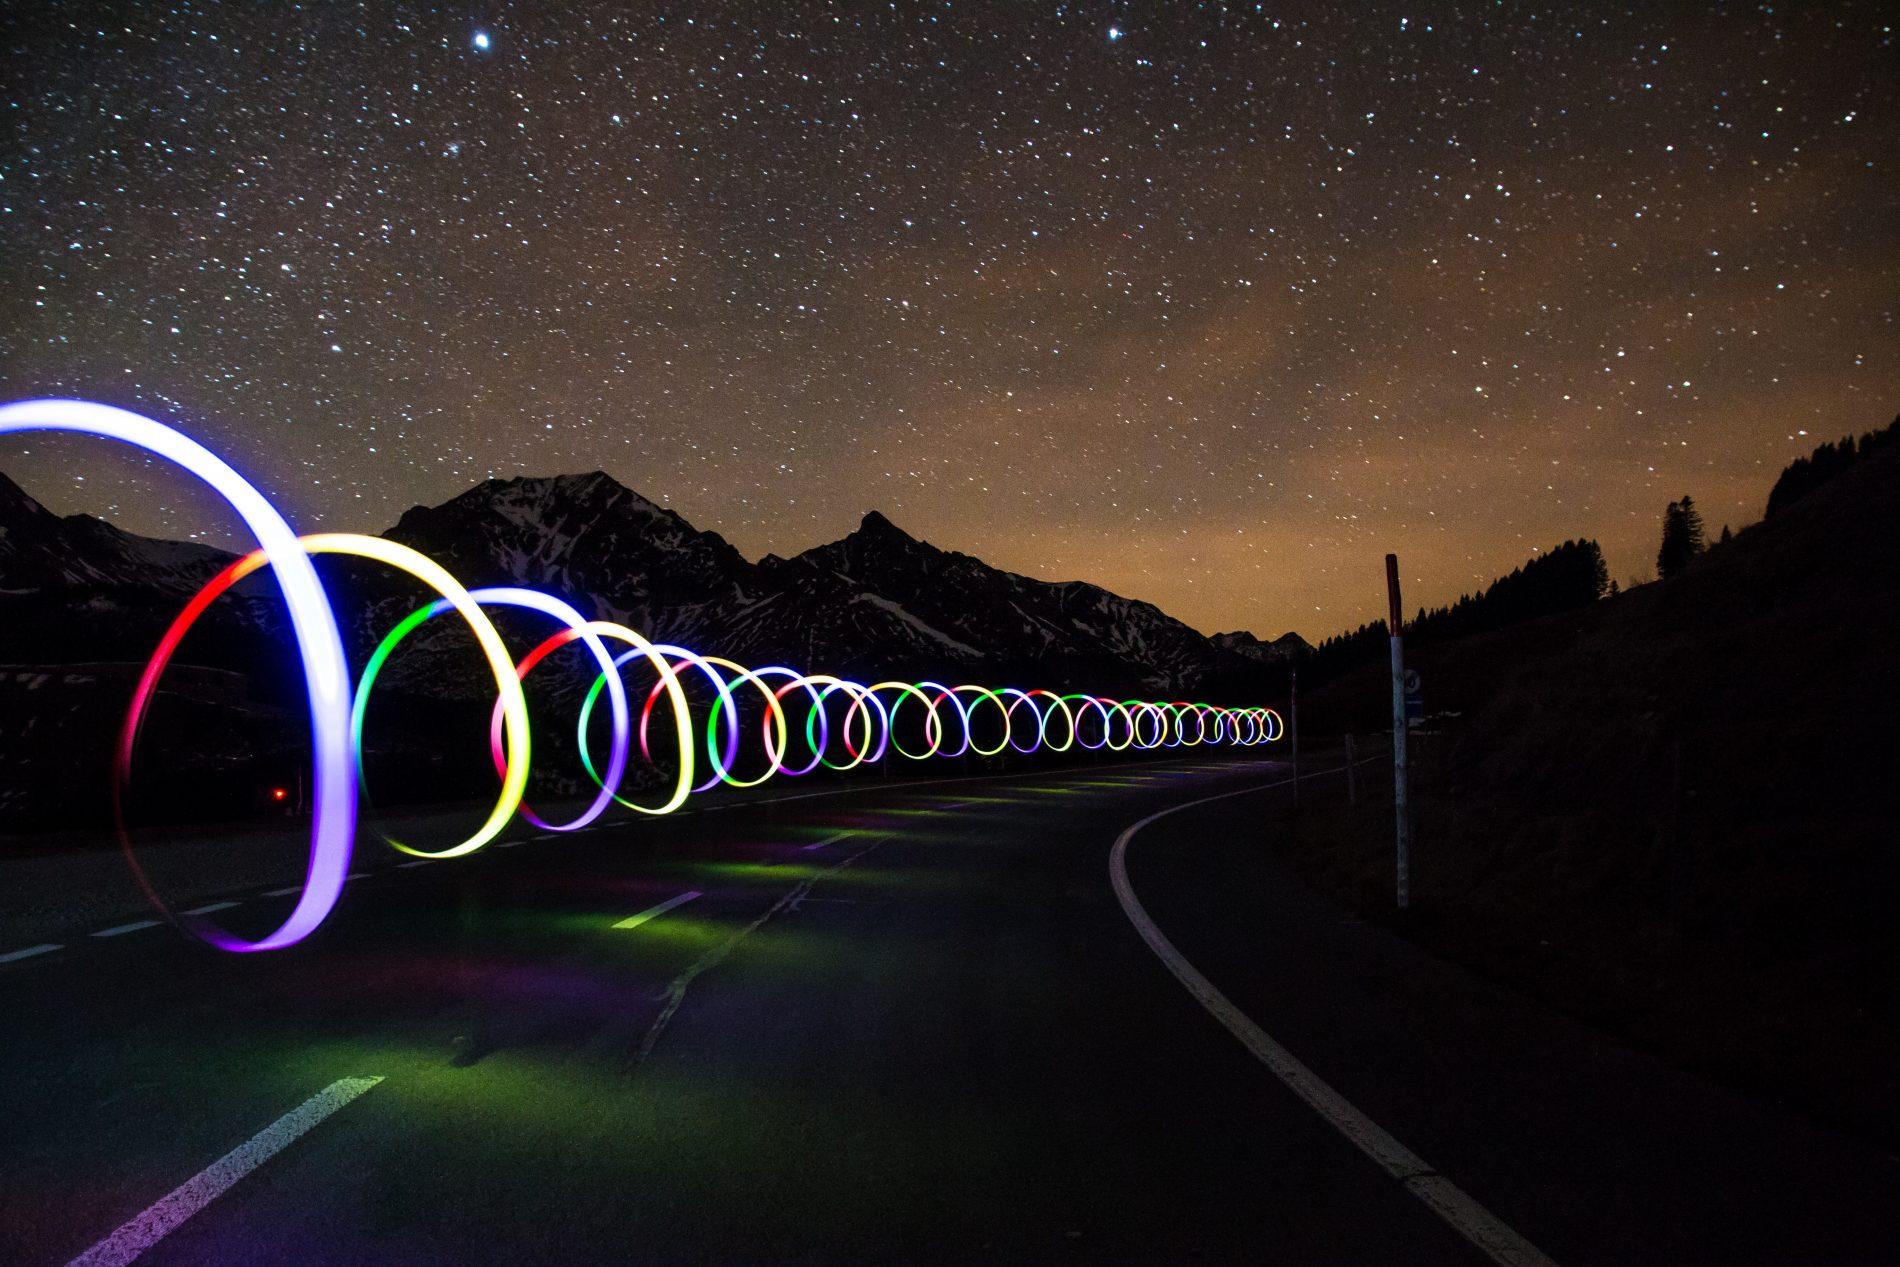 LIGHT-CYCLE_asphalt-blur-car-290470